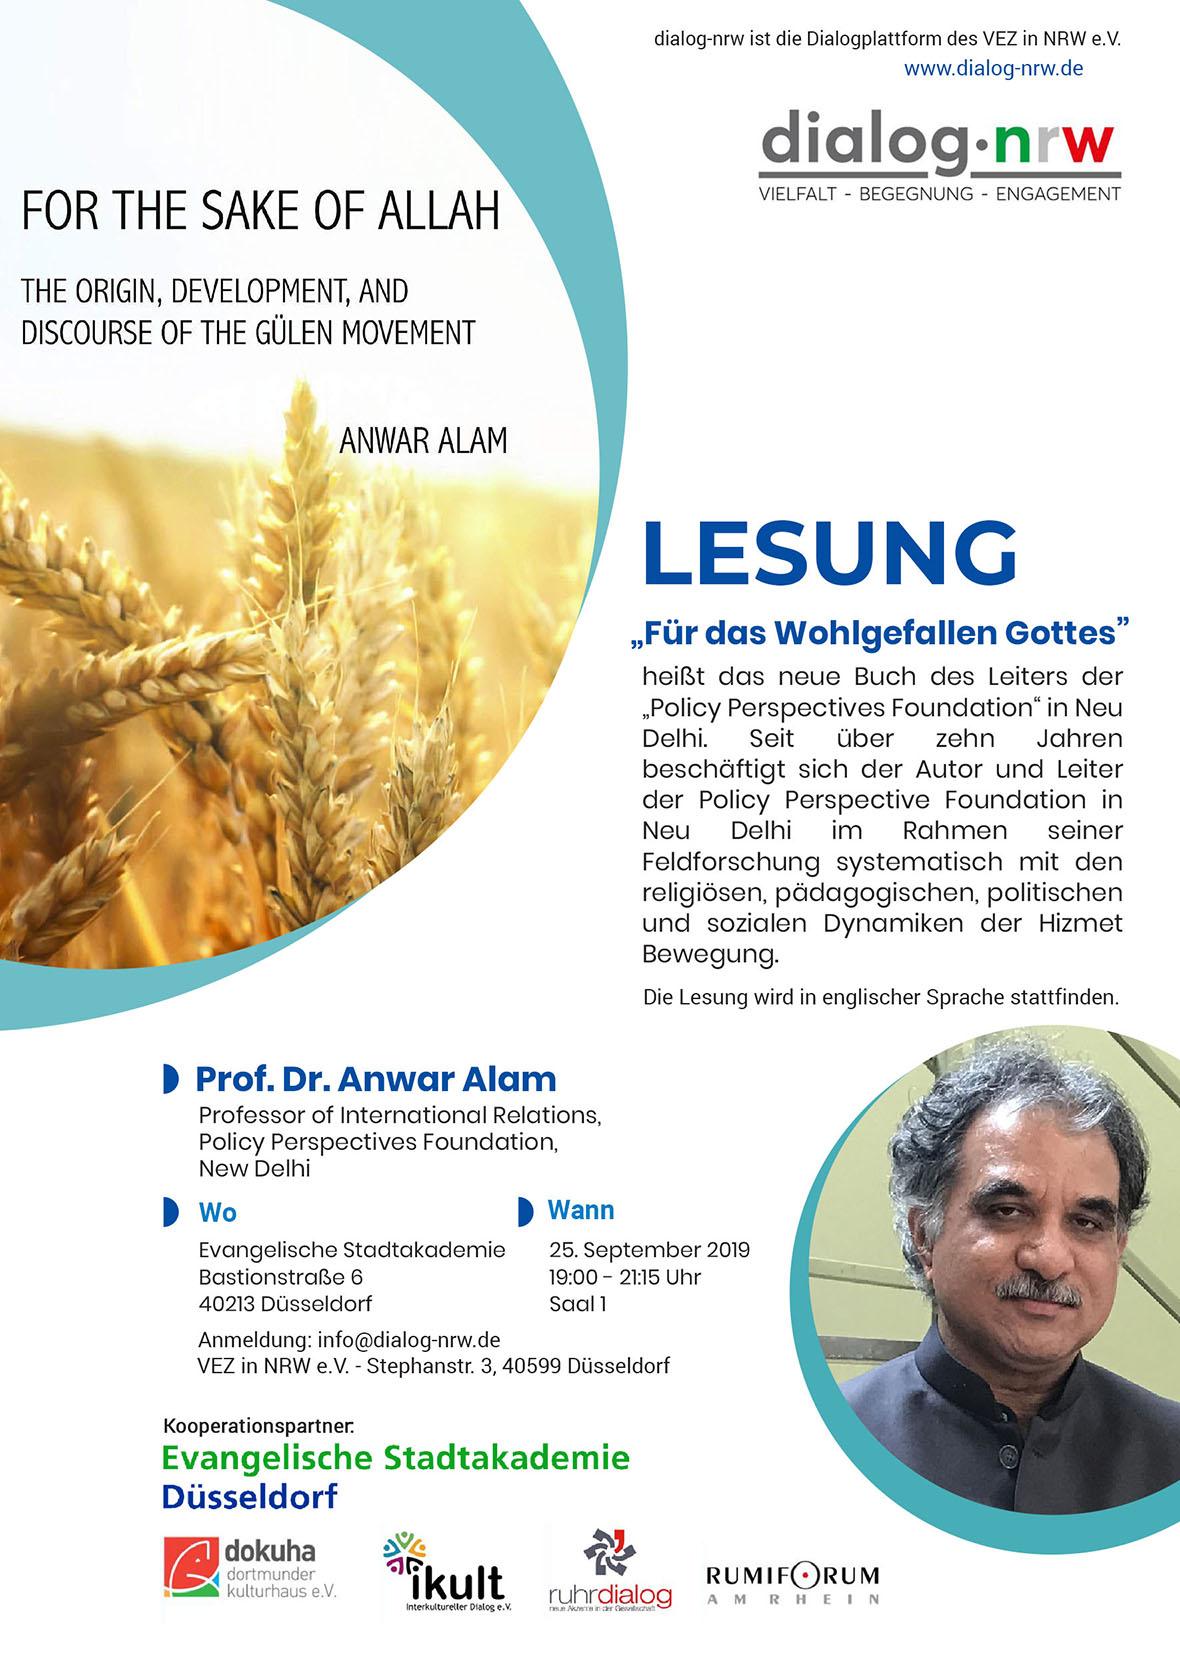 Lesung – For the sake of Allah